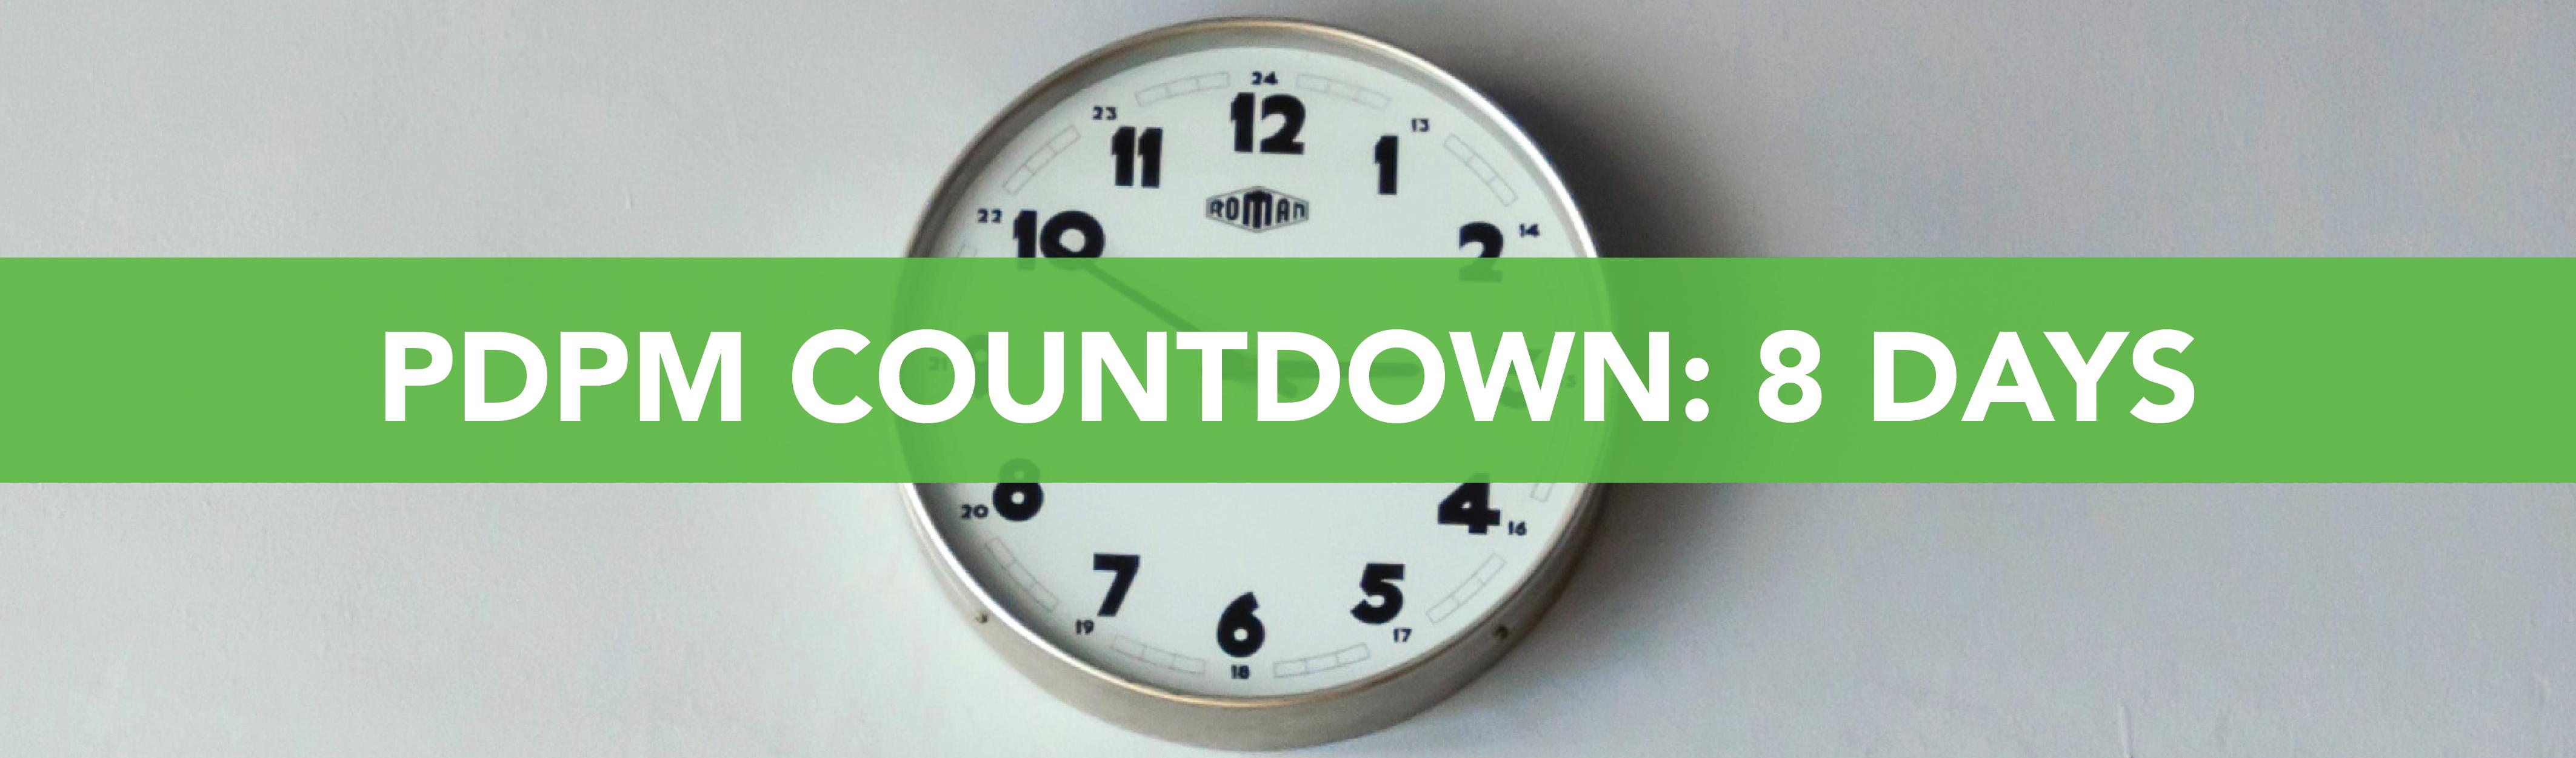 PDPM-Countdown-8days